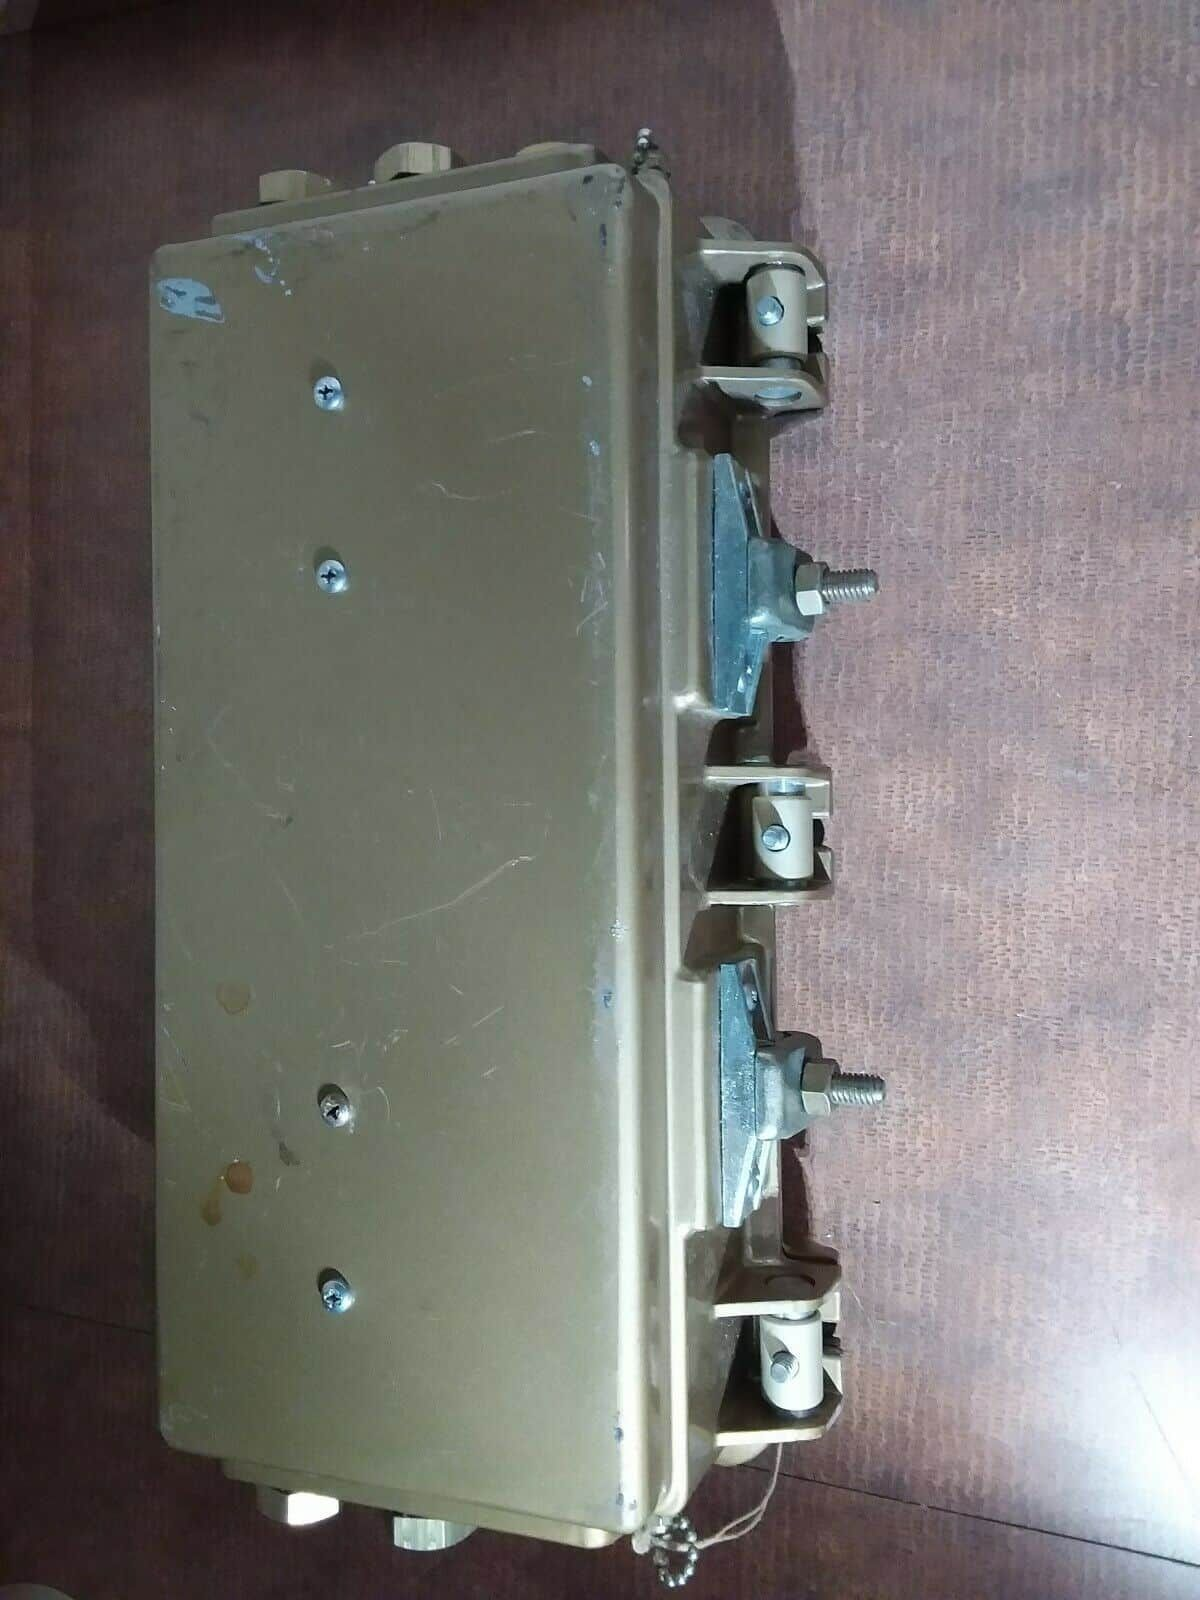 VIKOA Futura by Viking 12 High RF CATV Bridging Distribution Amplifier 50-220mc